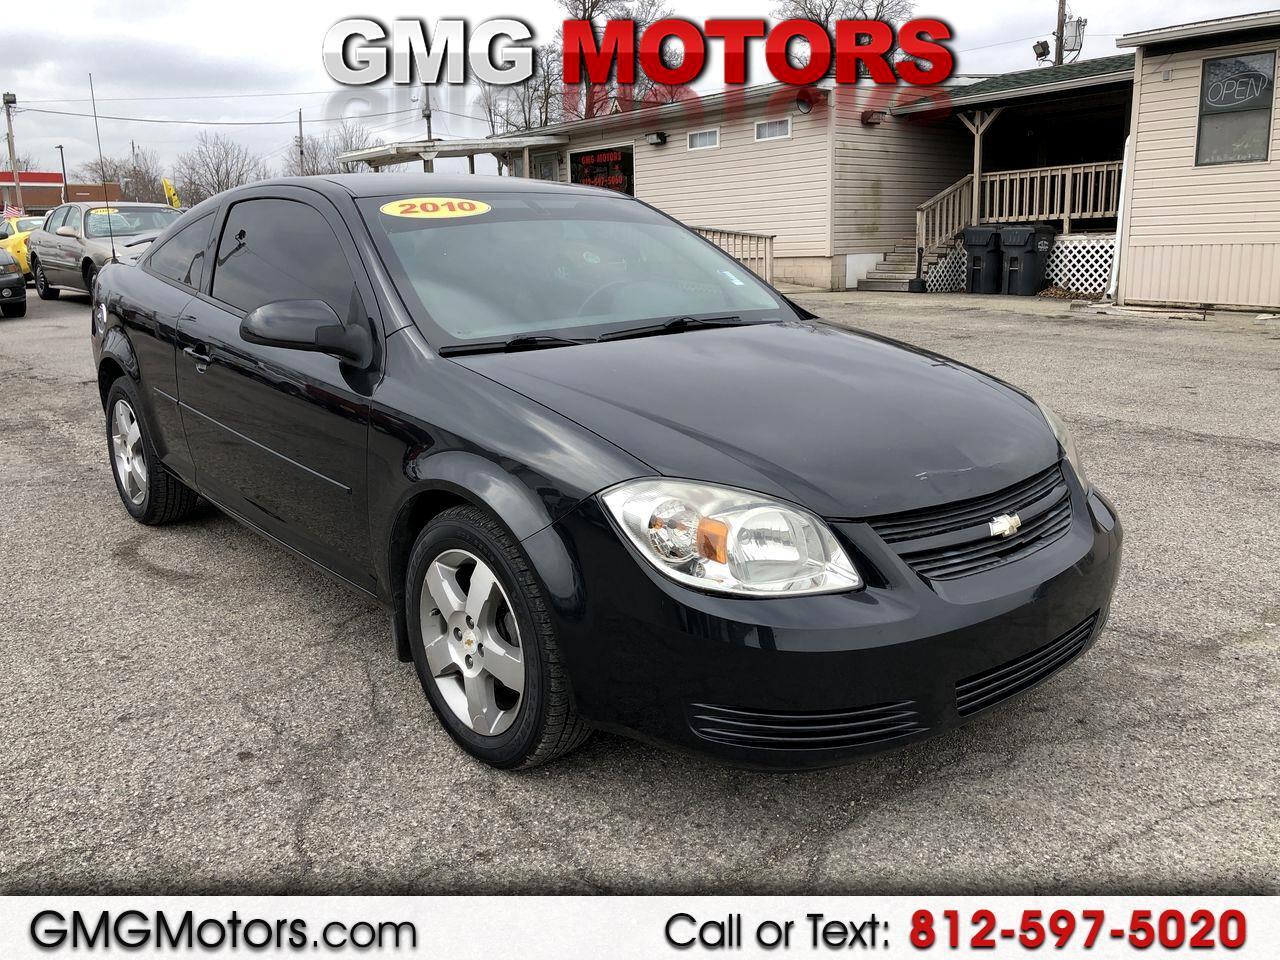 2010 Chevrolet Cobalt 2dr Cpe LT w/1LT